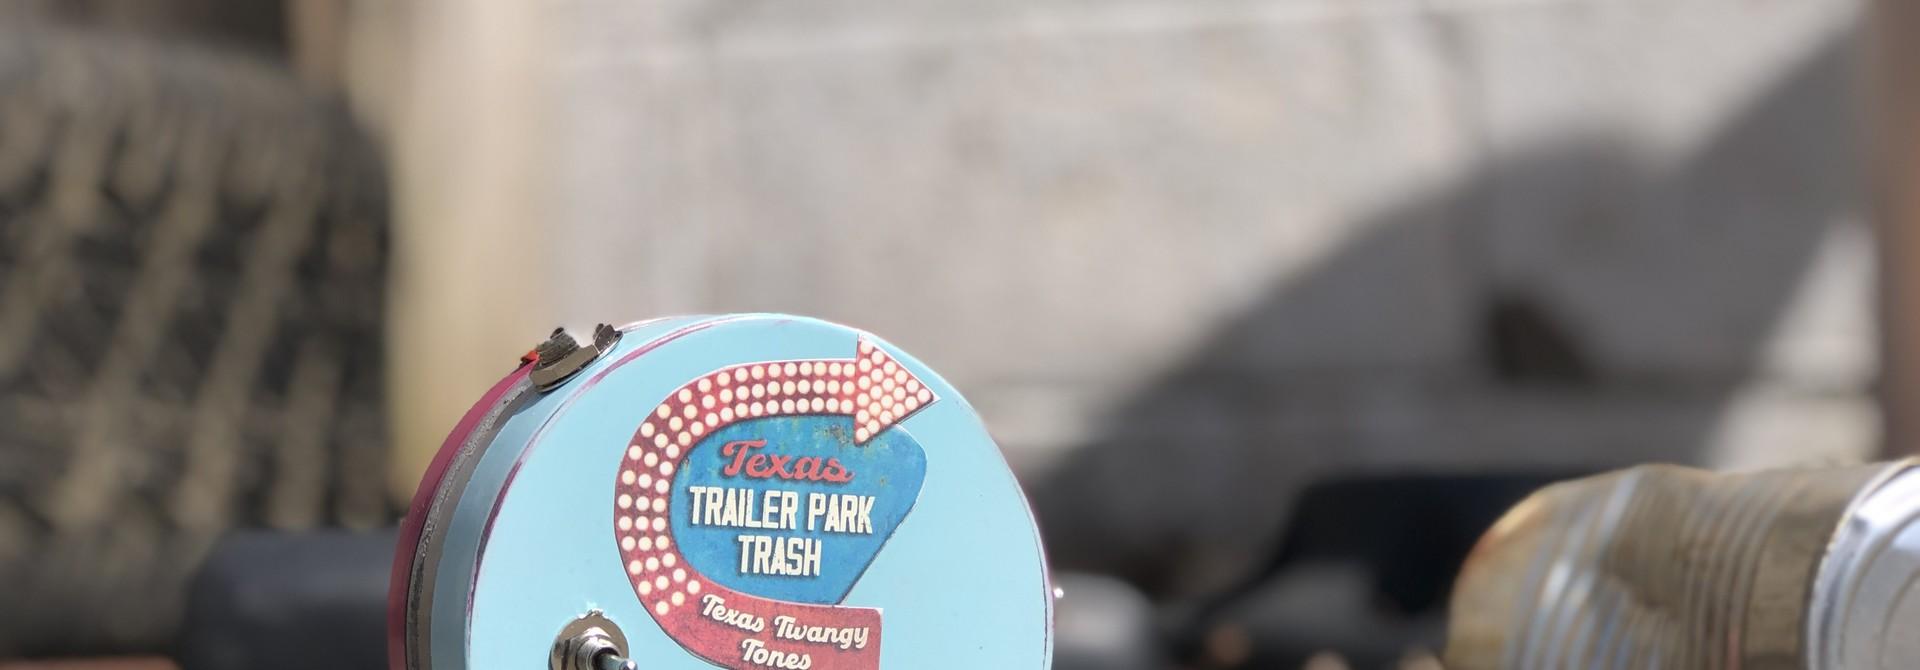 "Rick Crownover Texas Trailer Park Trash  - Russian Germanium ""Range Master"" clone."